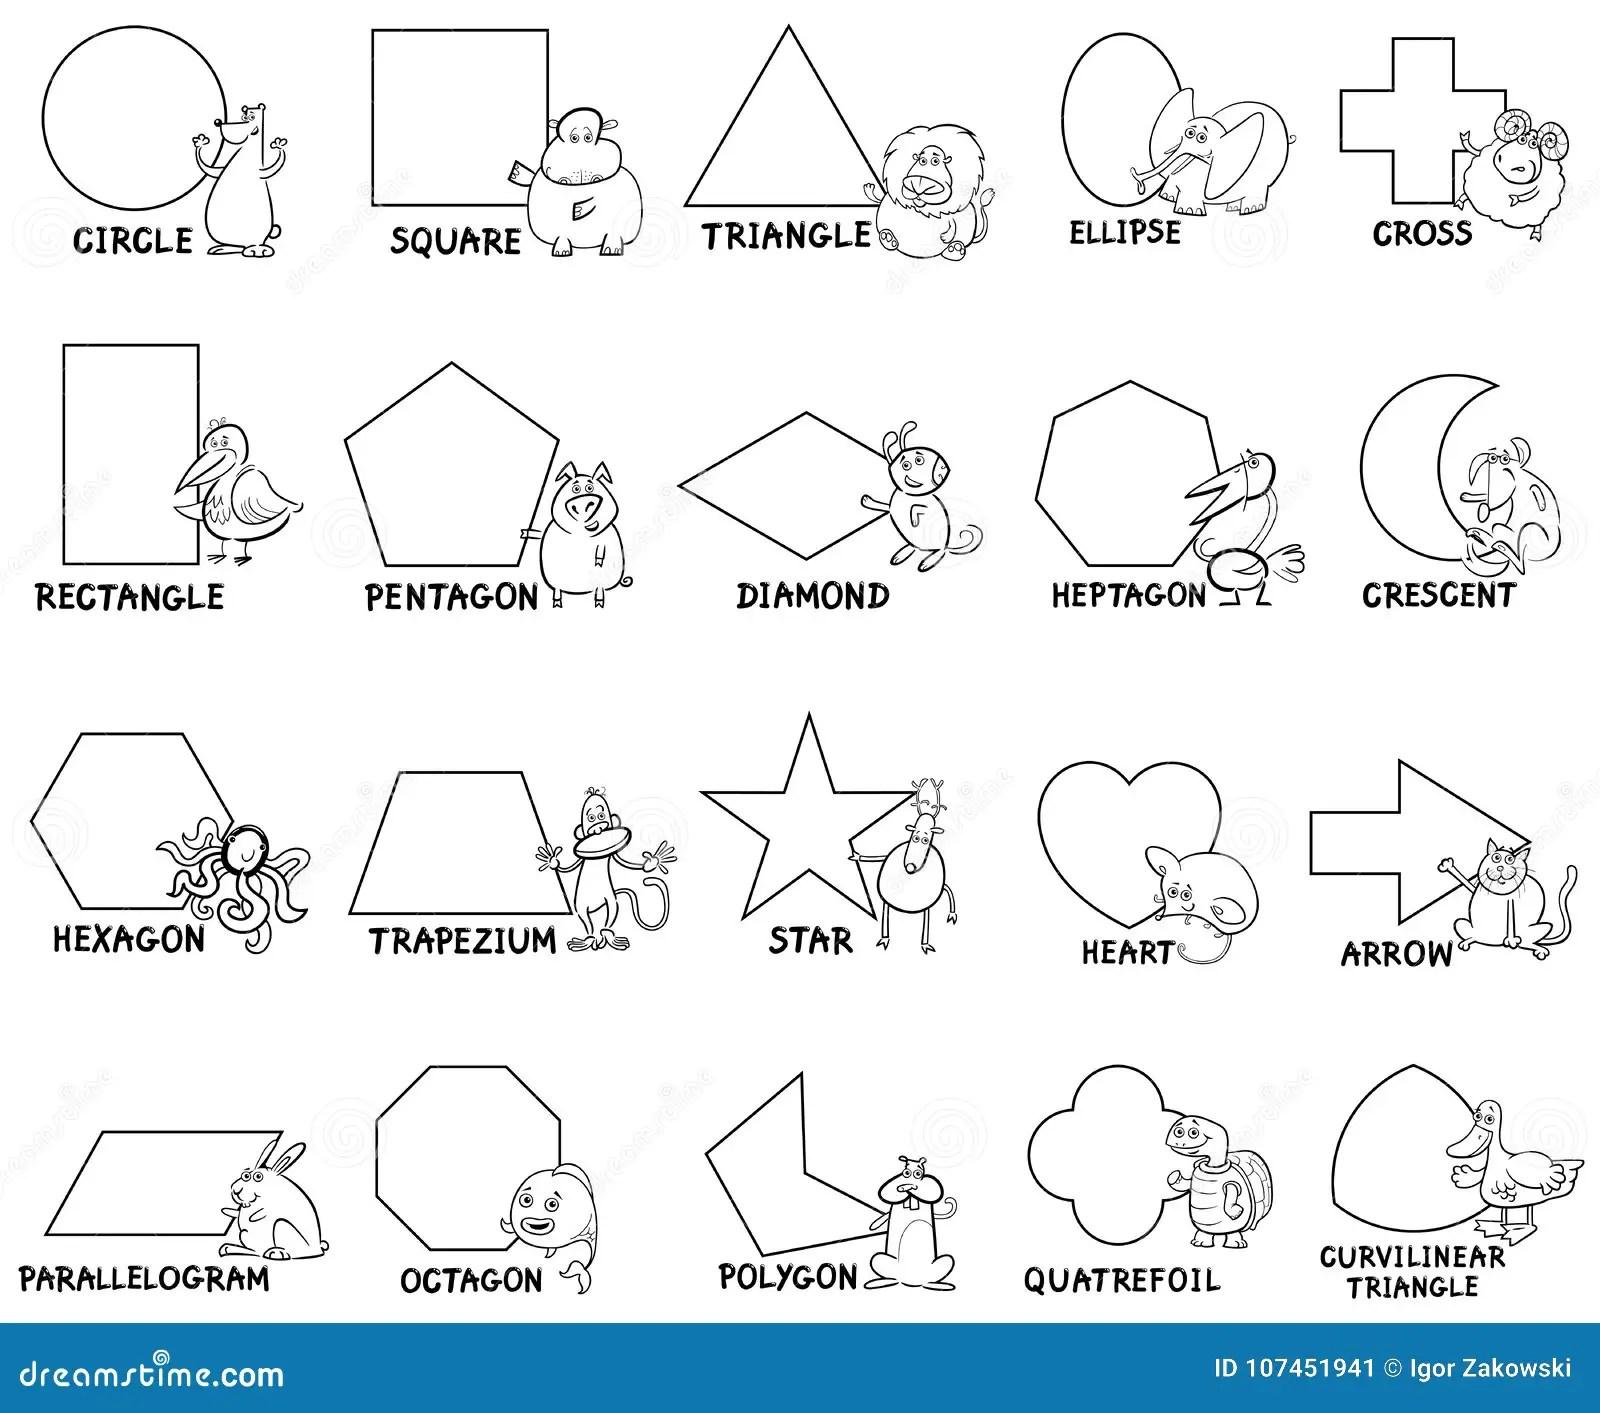 Curvilinear Triangle Worksheets Preschool Curvilinear